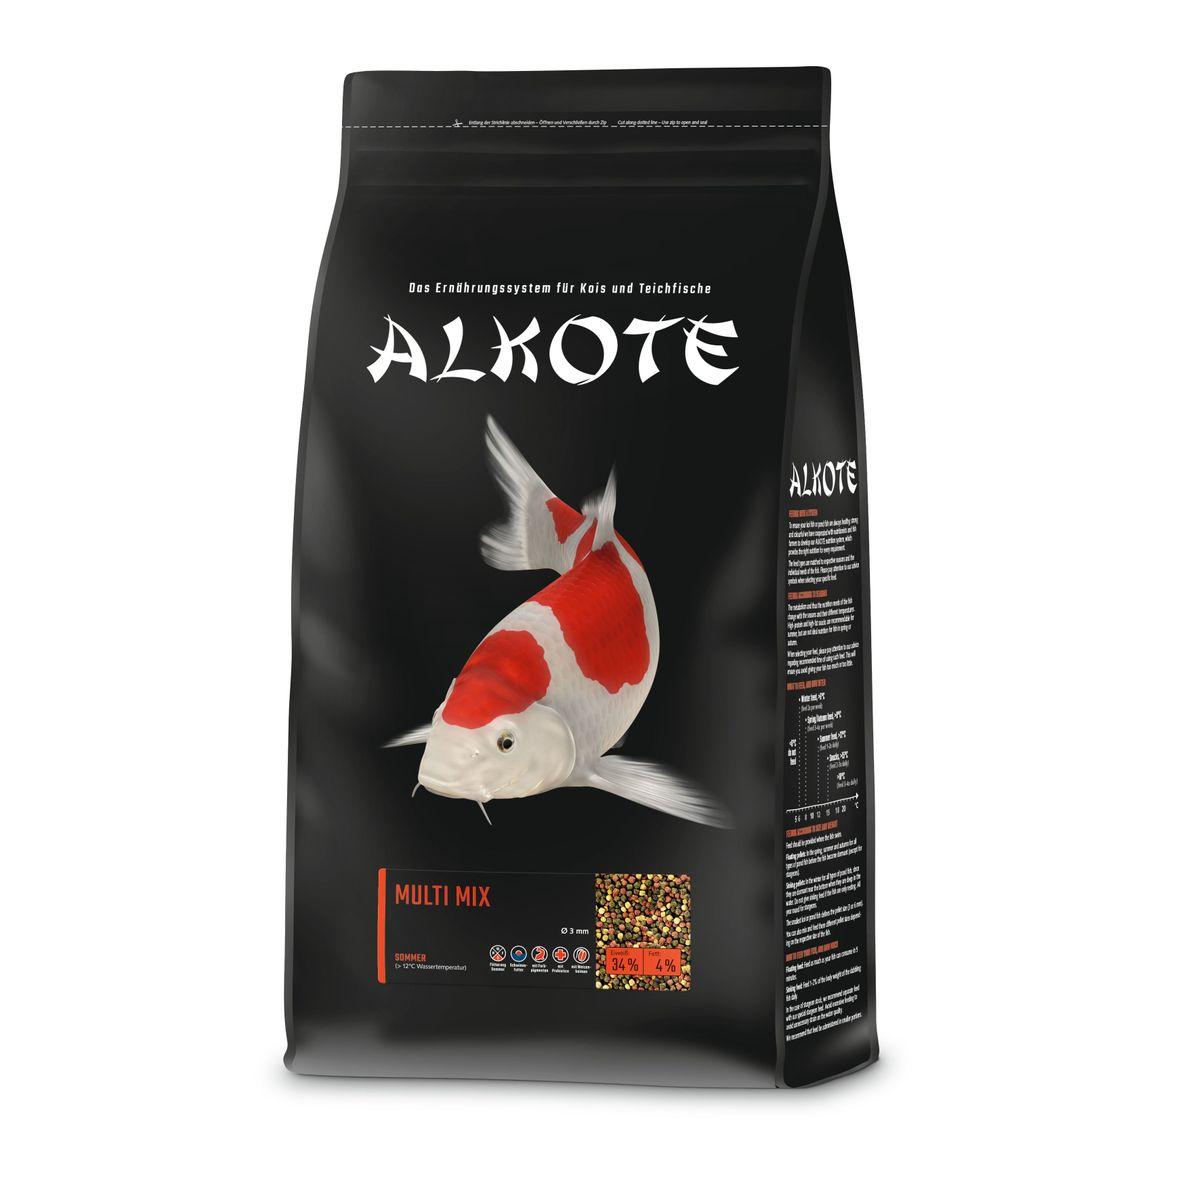 AL-KO-TE Multi-Mix 3mm | 3kg Allco Teichfutter, Koifutter